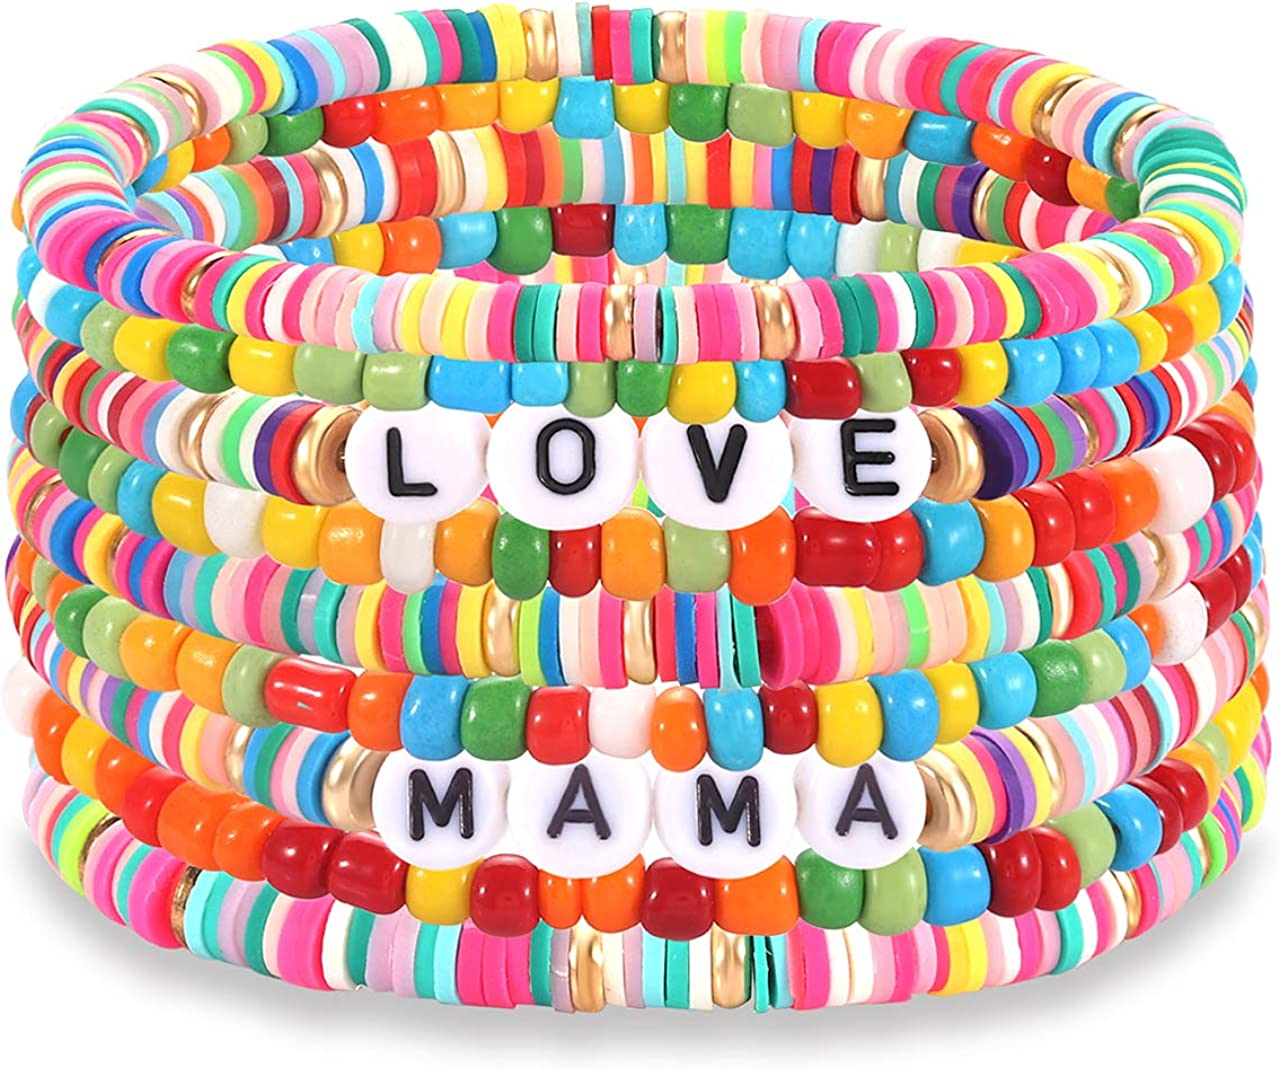 Heishi Bracelets for Women Colorful Vinyl Disc Bead Stretch Bracelets Stackable Beach Surf Letter Strand Bracelets for Girls Birthday Party Gifts